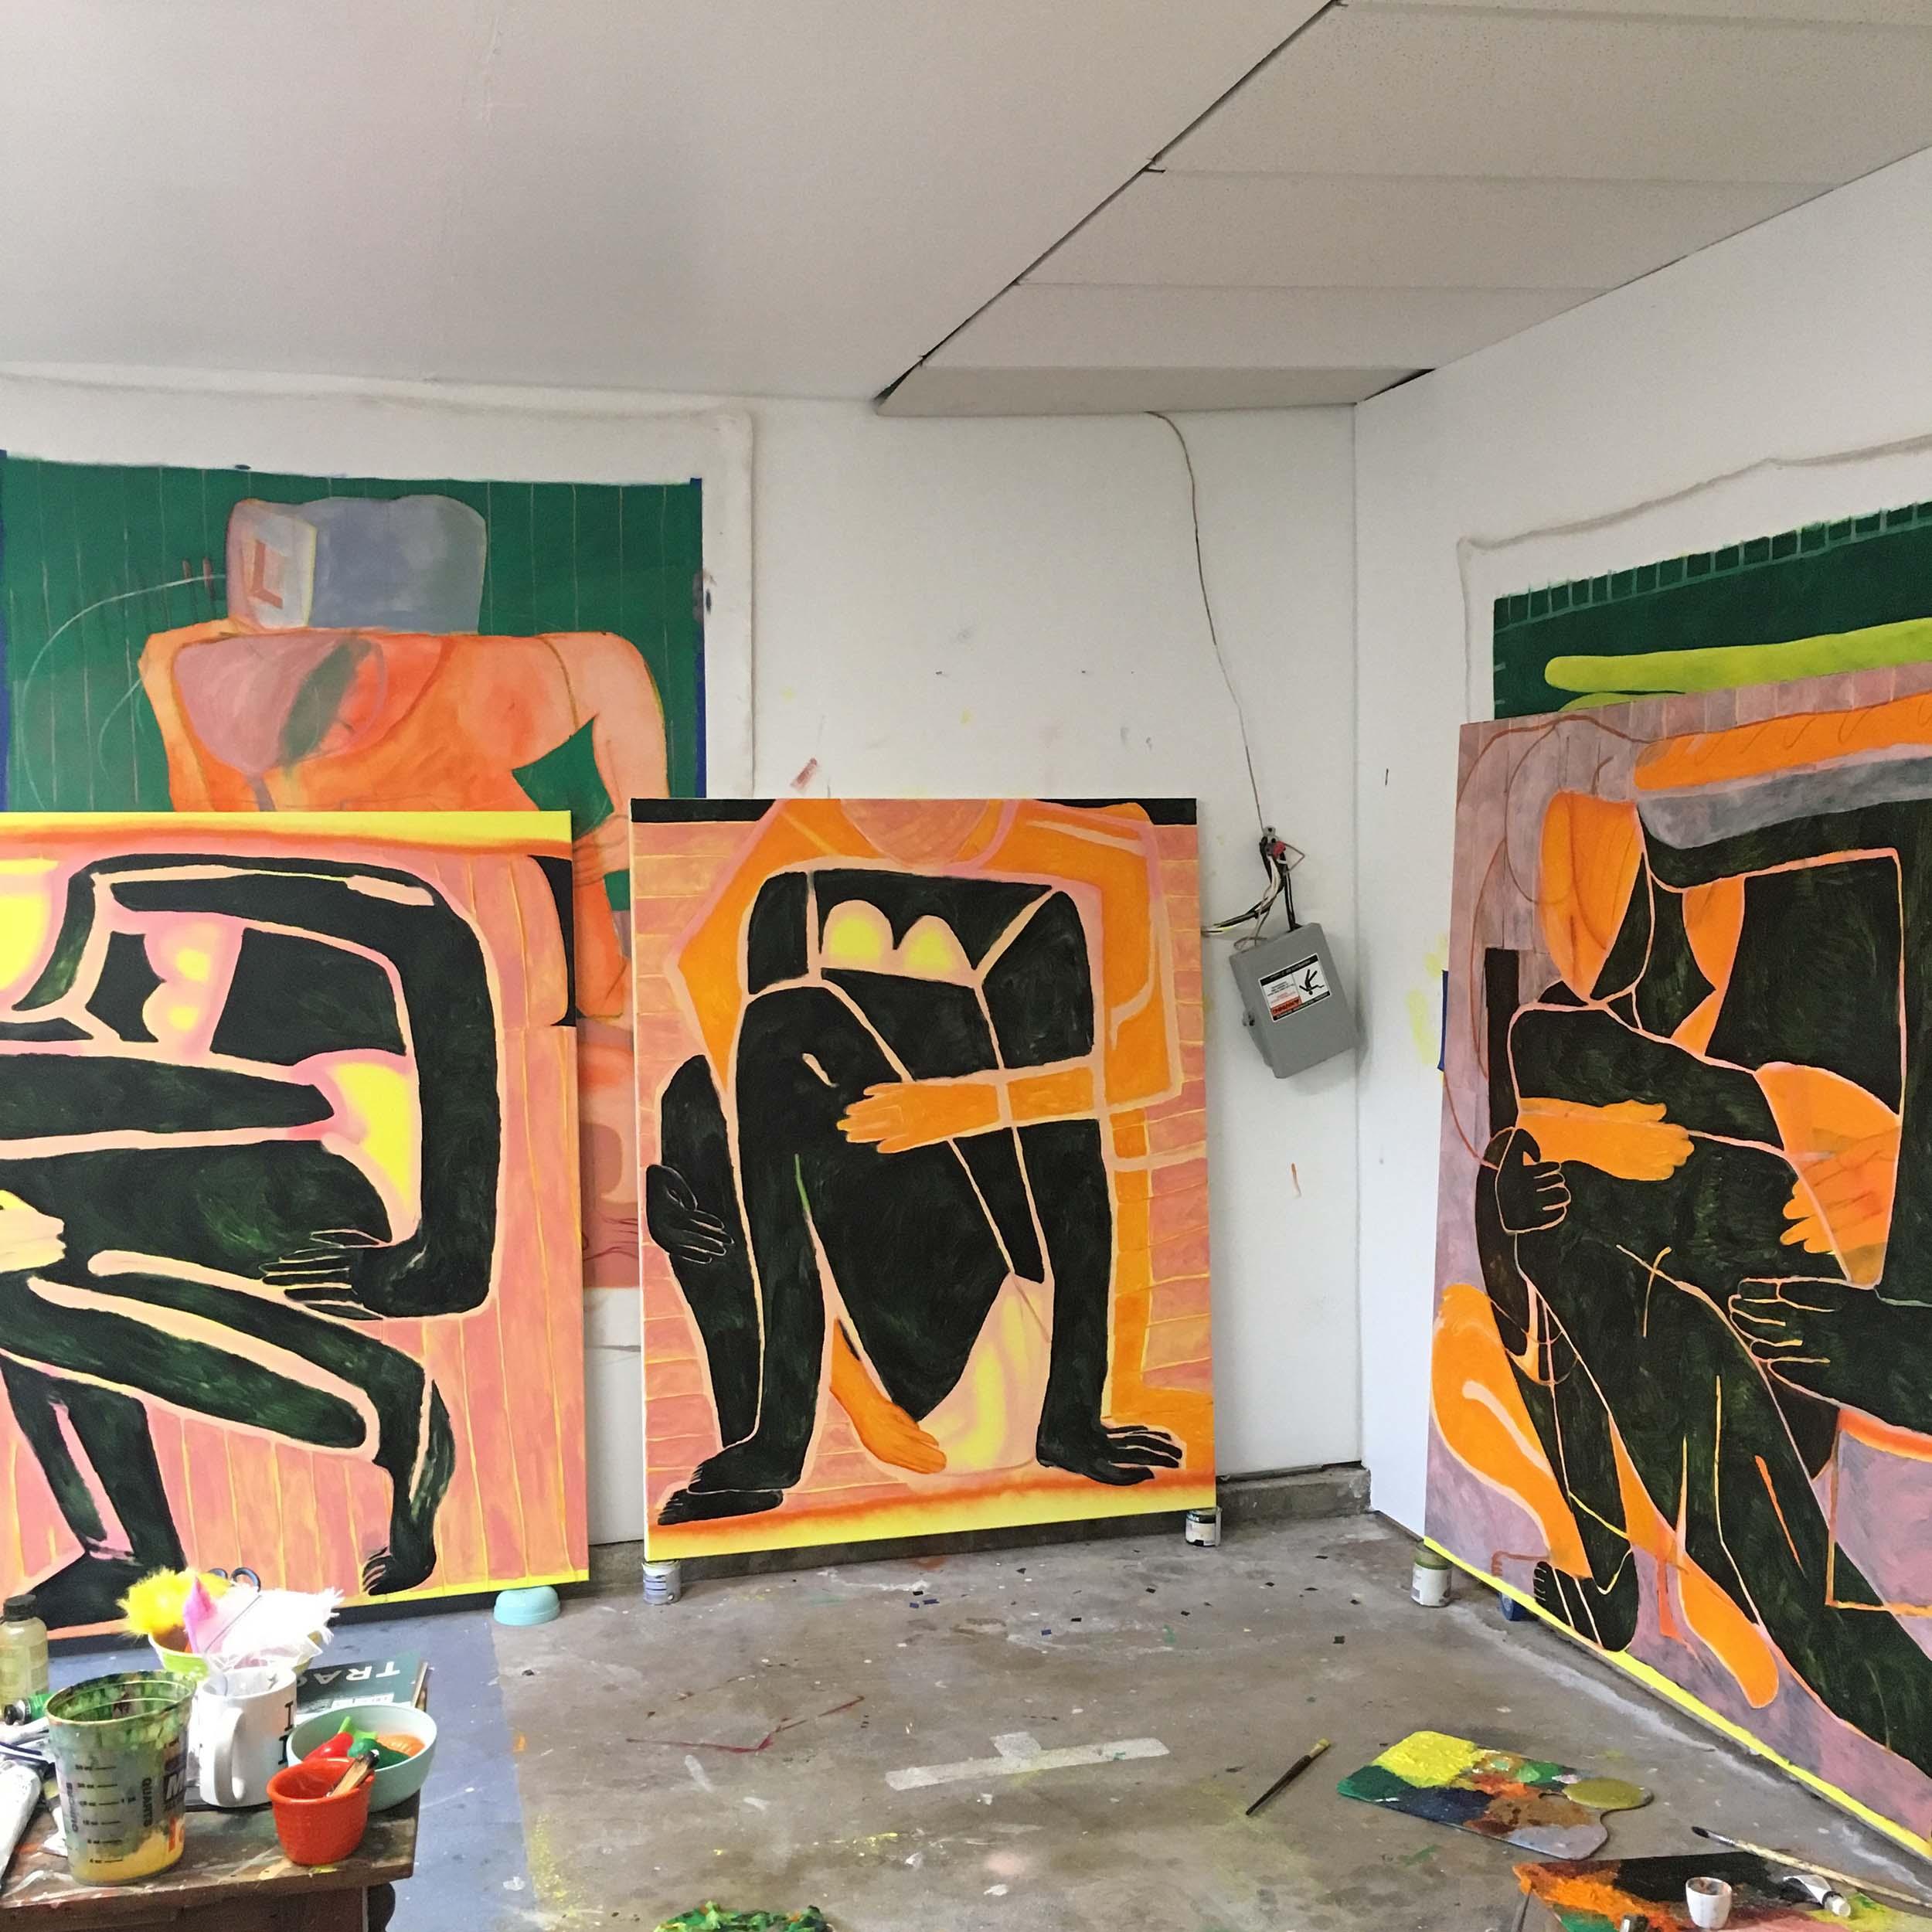 Lonsdale's studio